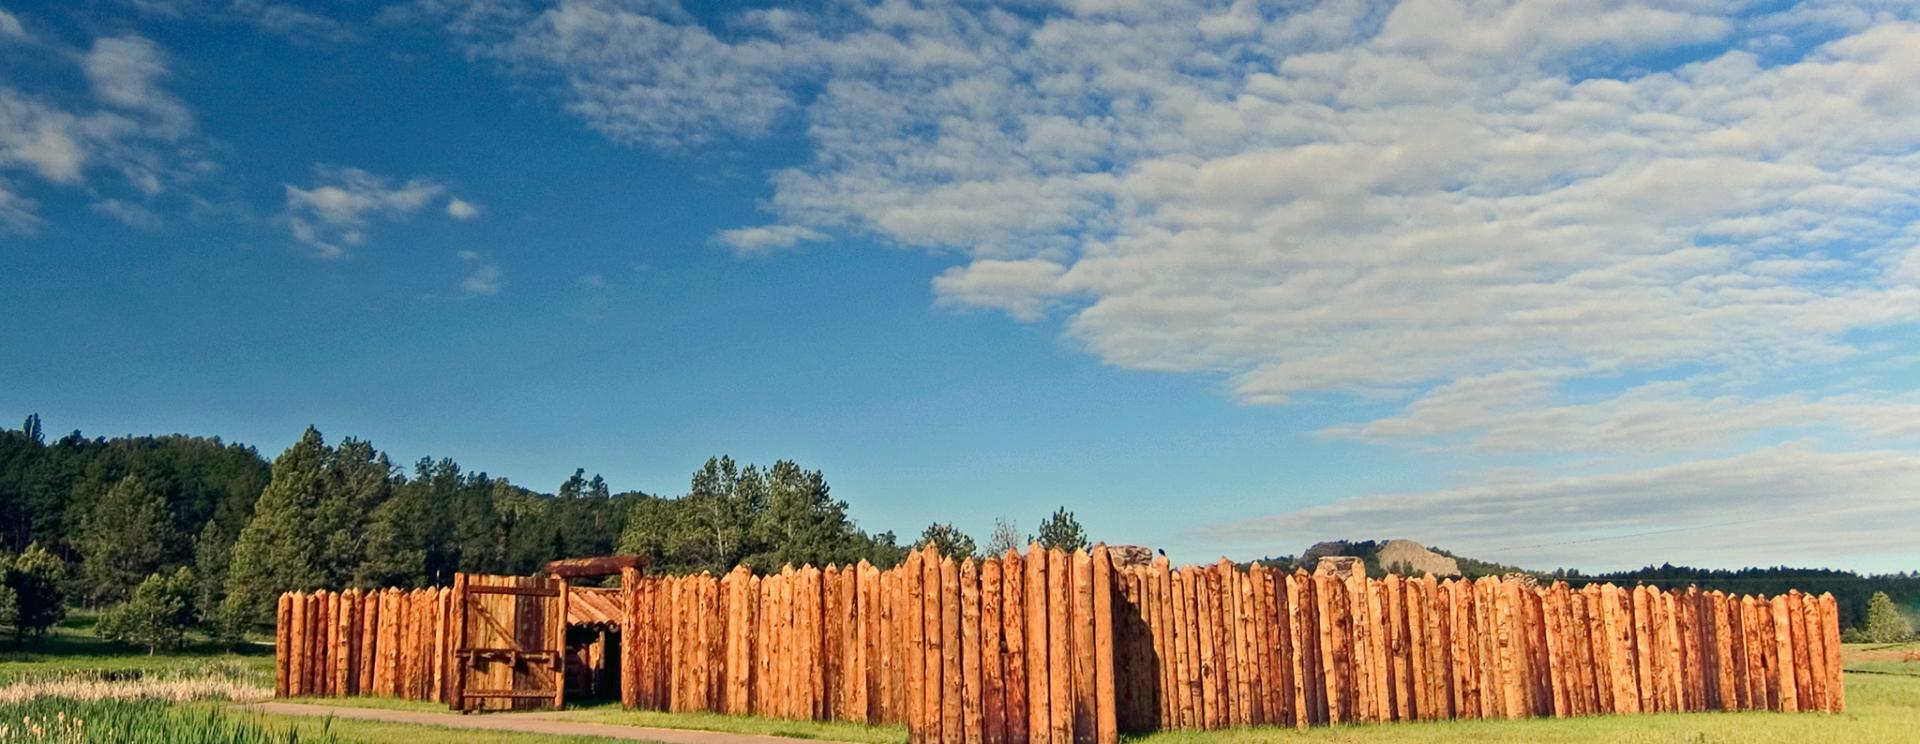 The Gordon Stockade